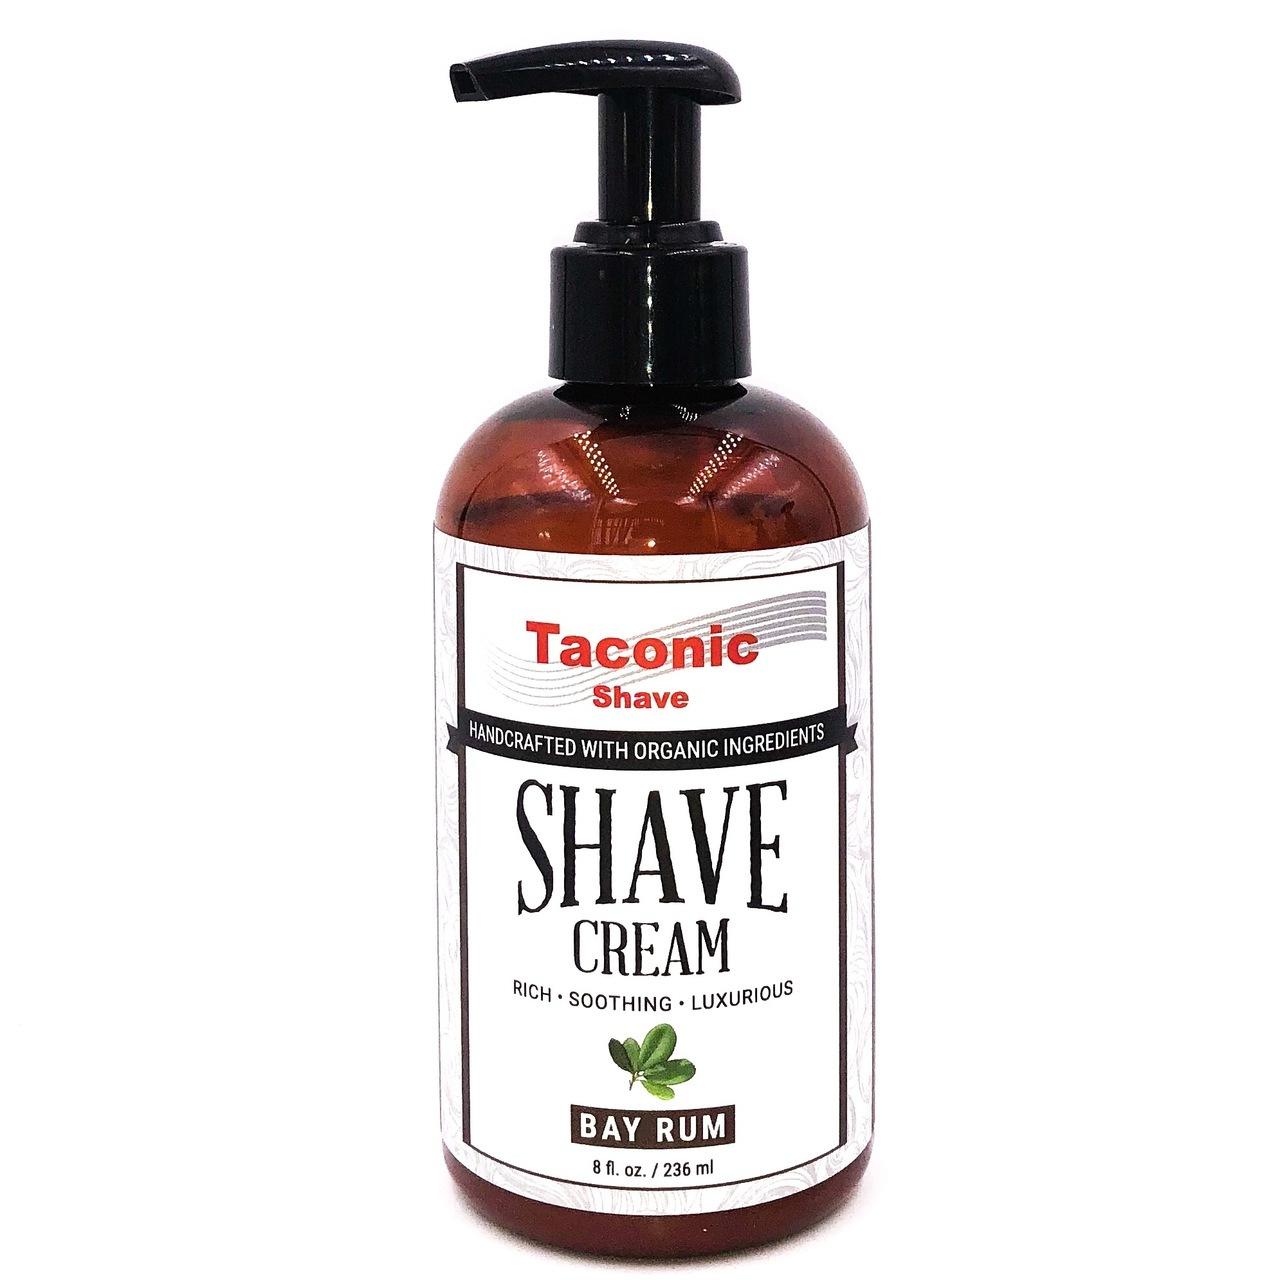 Taconic Shave Cream Bay Pump Bay Rum 8oz on white background.